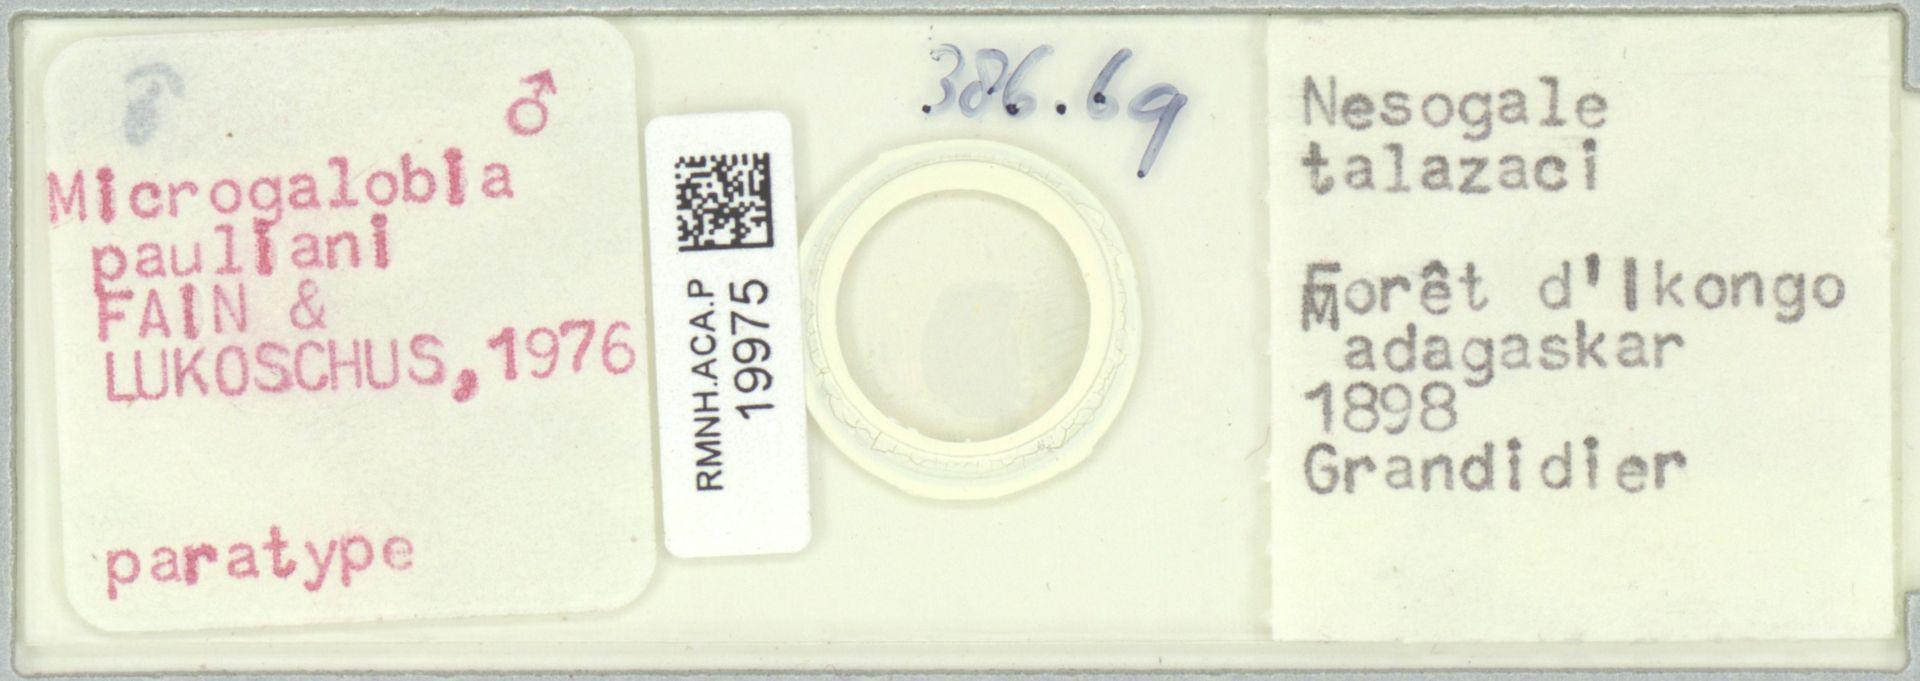 RMNH.ACA.P.19975 | Microgalobia pauliani Fain & Lukoschus 1976